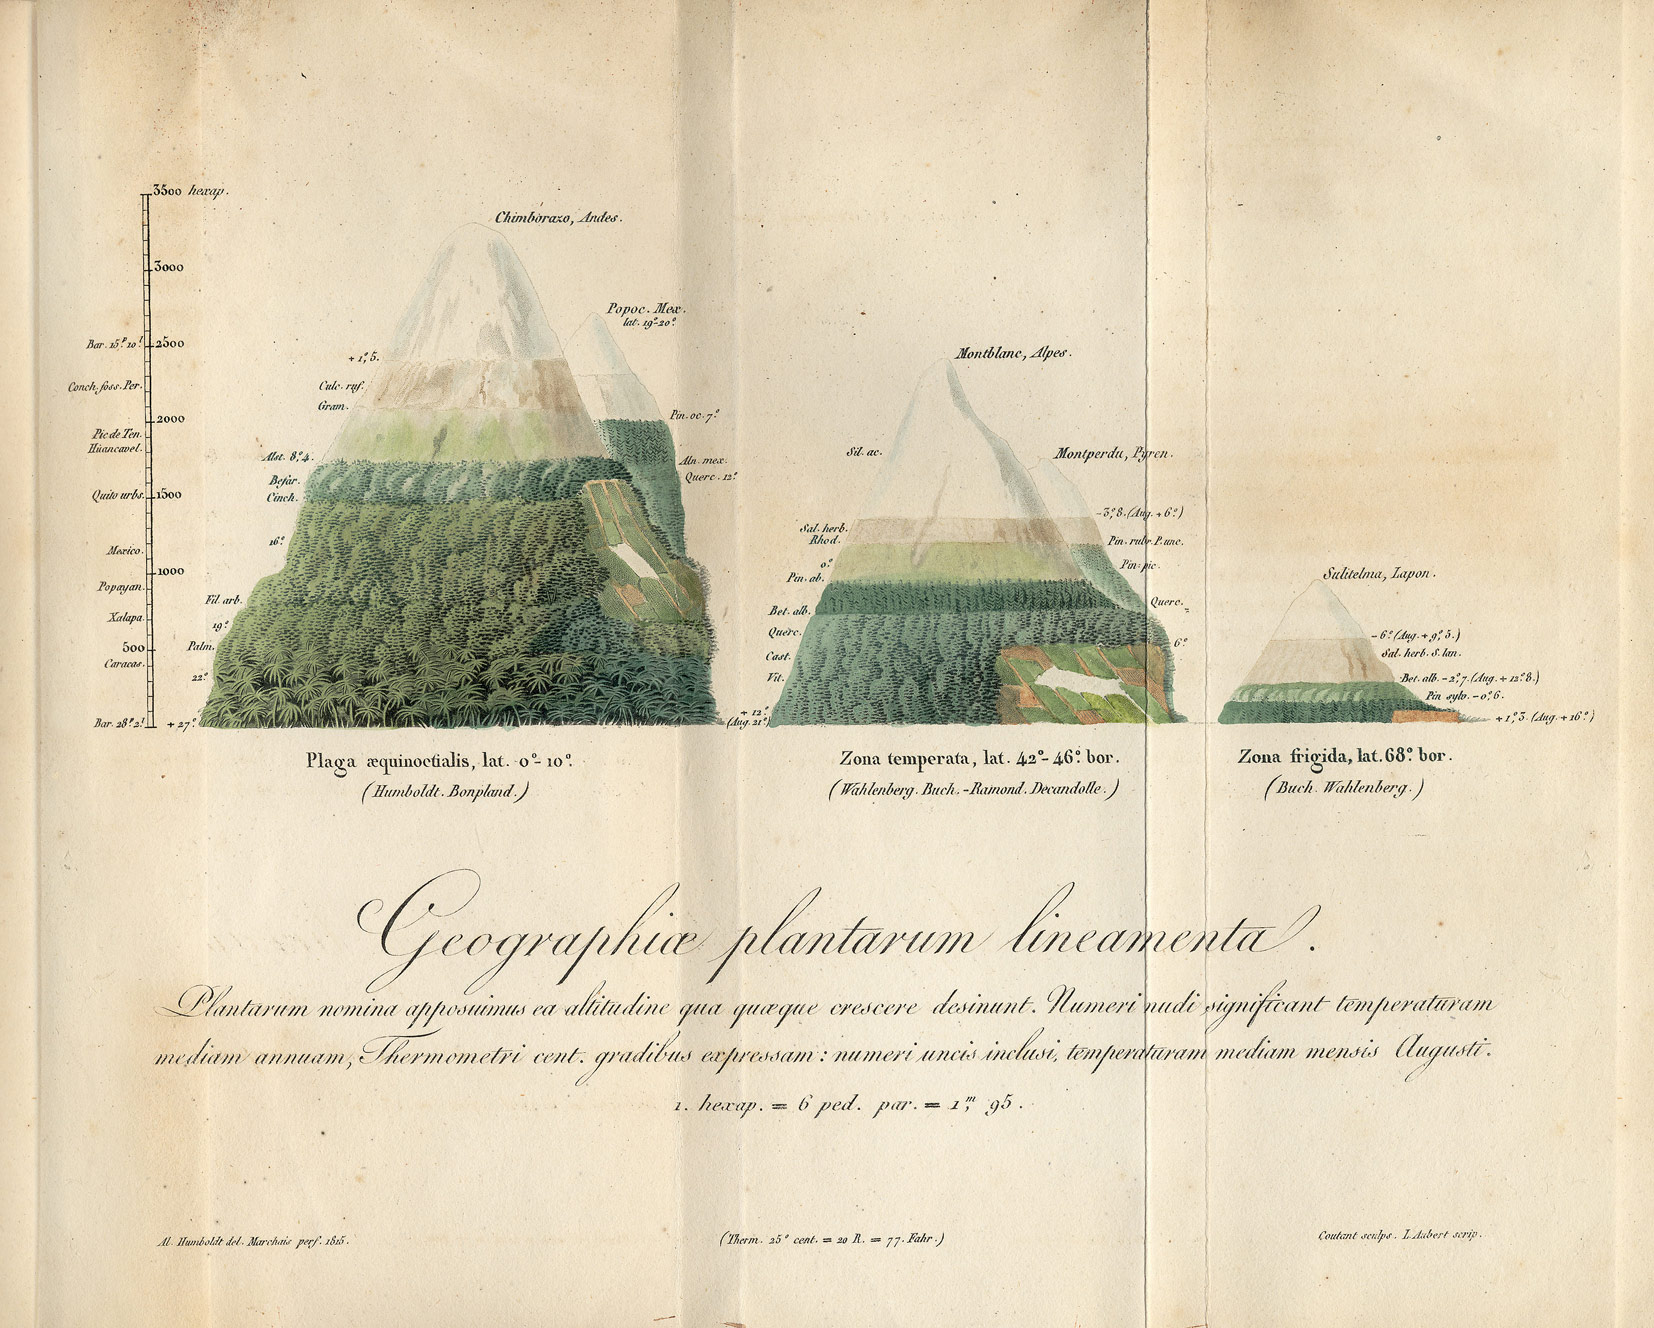 Geographiae plantarum lineamenta